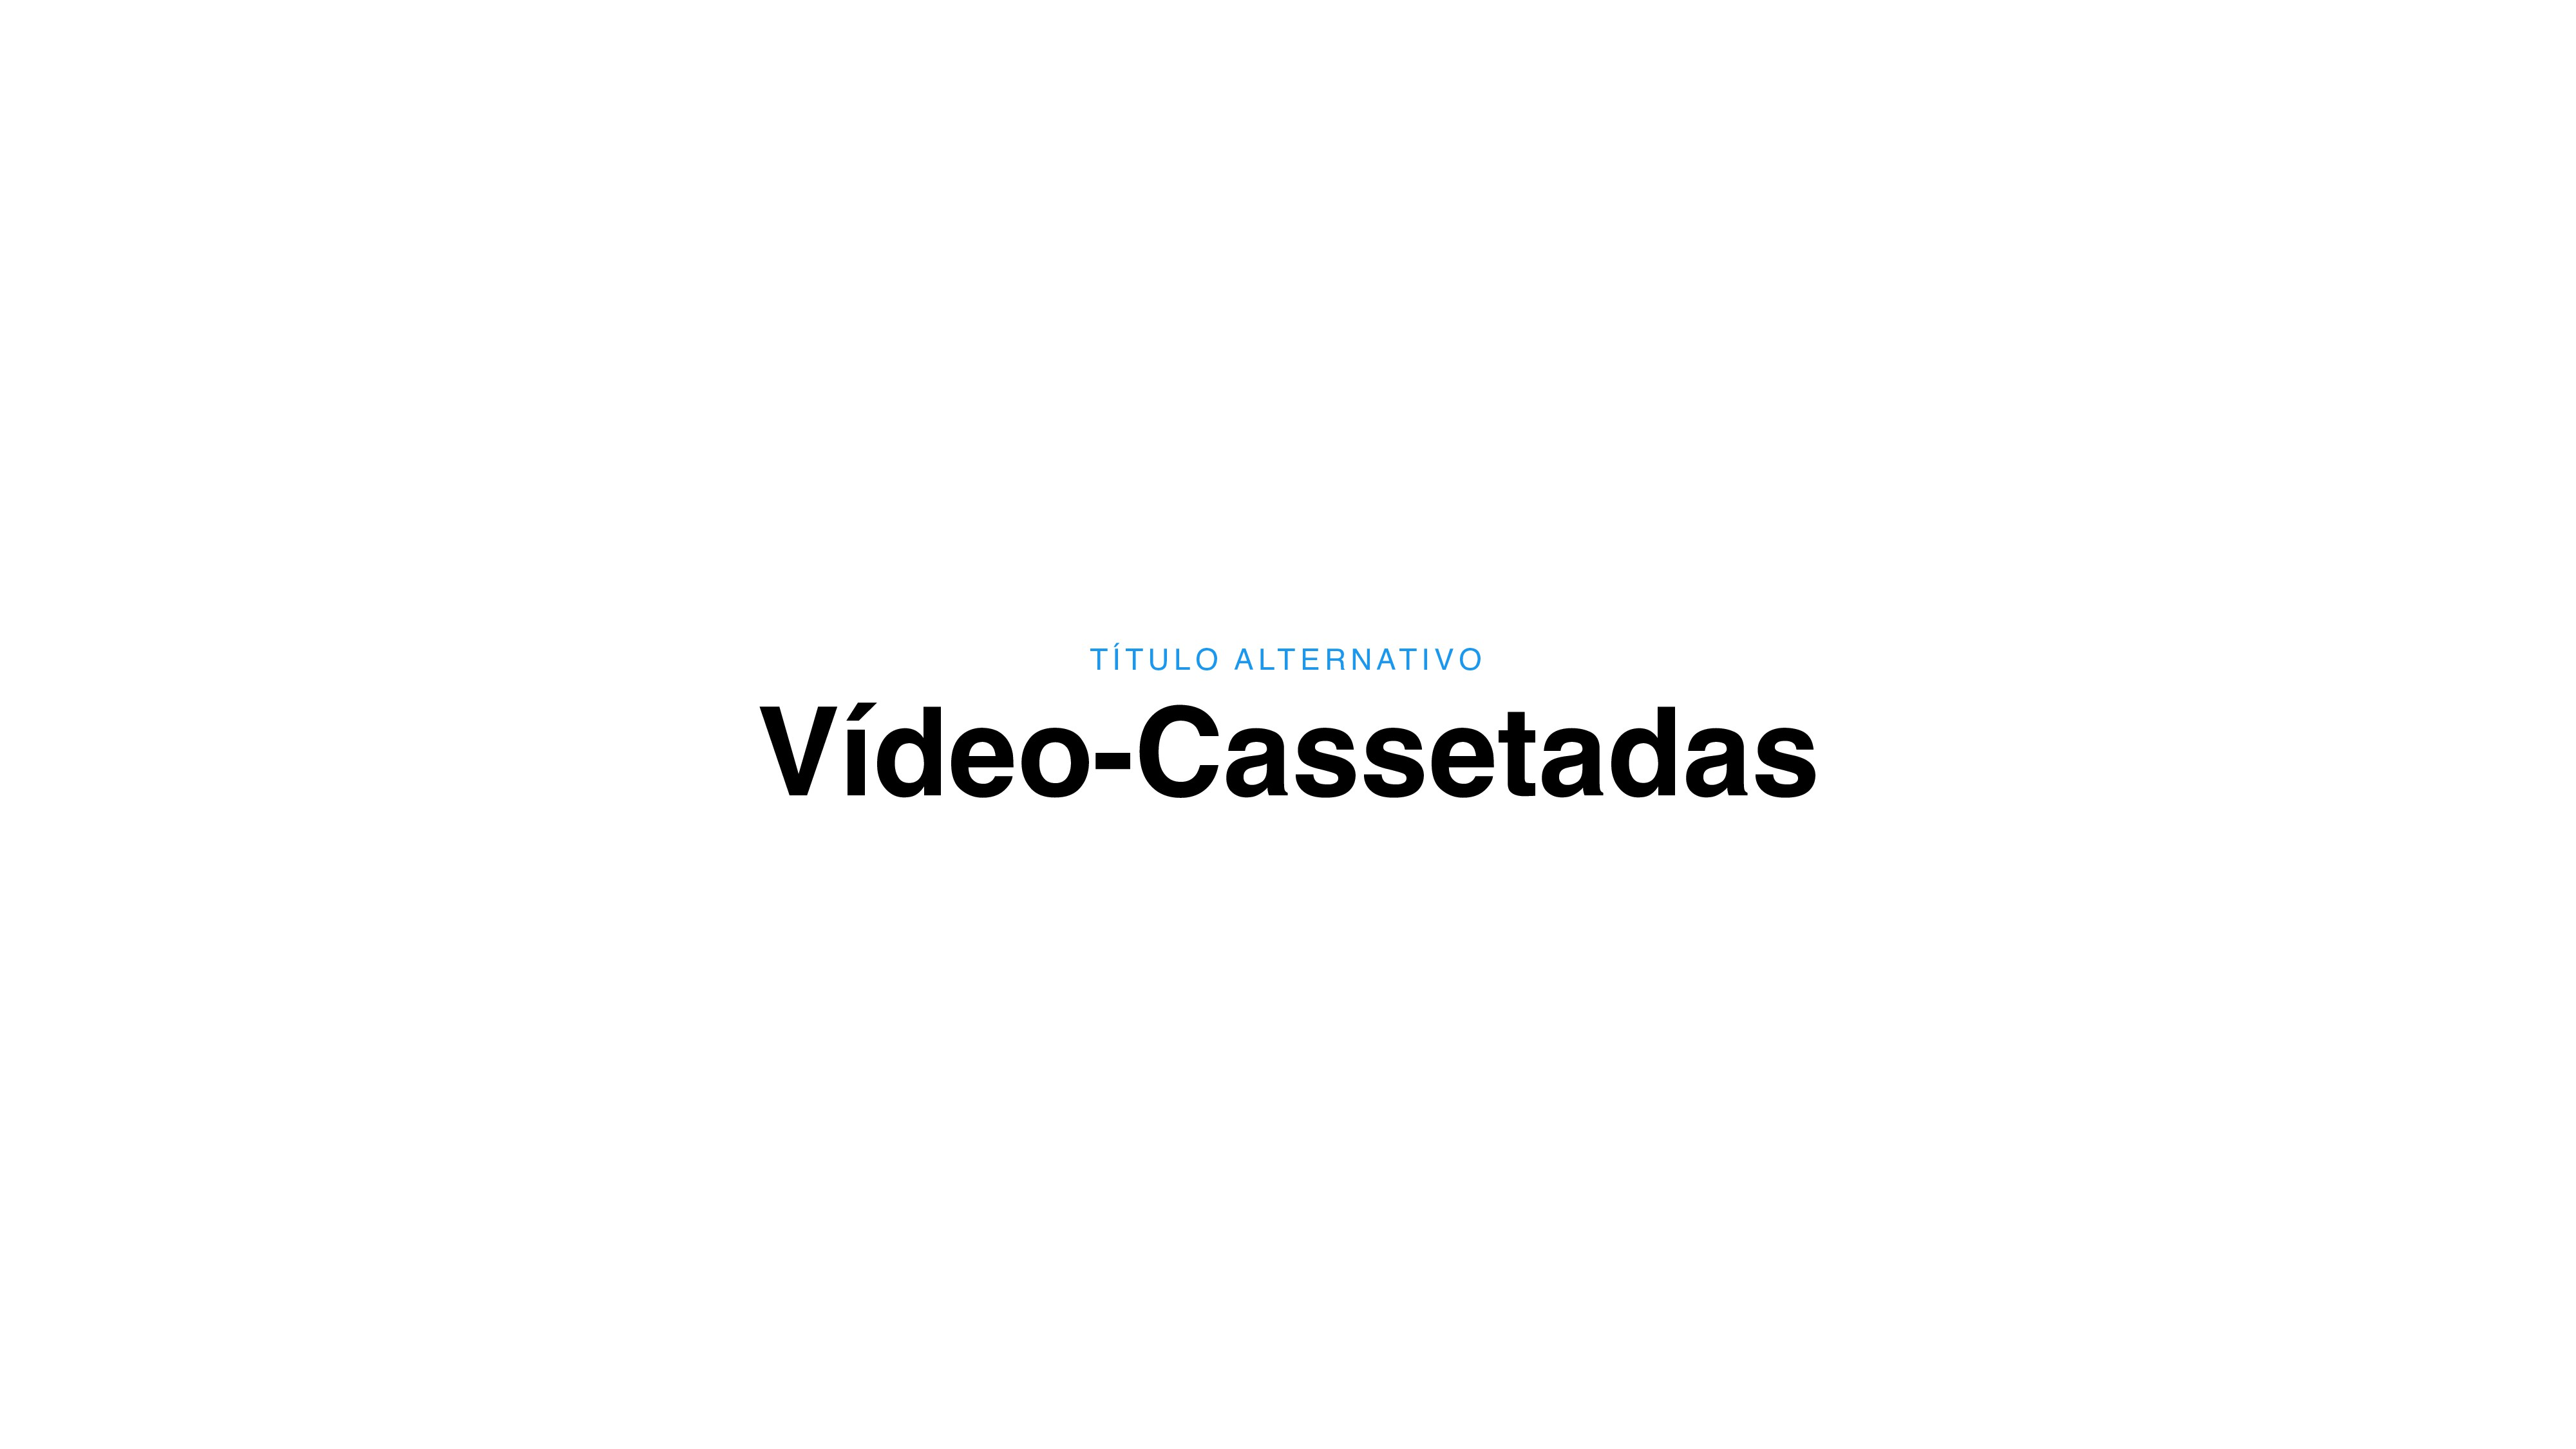 Vídeo-Cassetadas T Í T U L O A LT E R N AT I V O